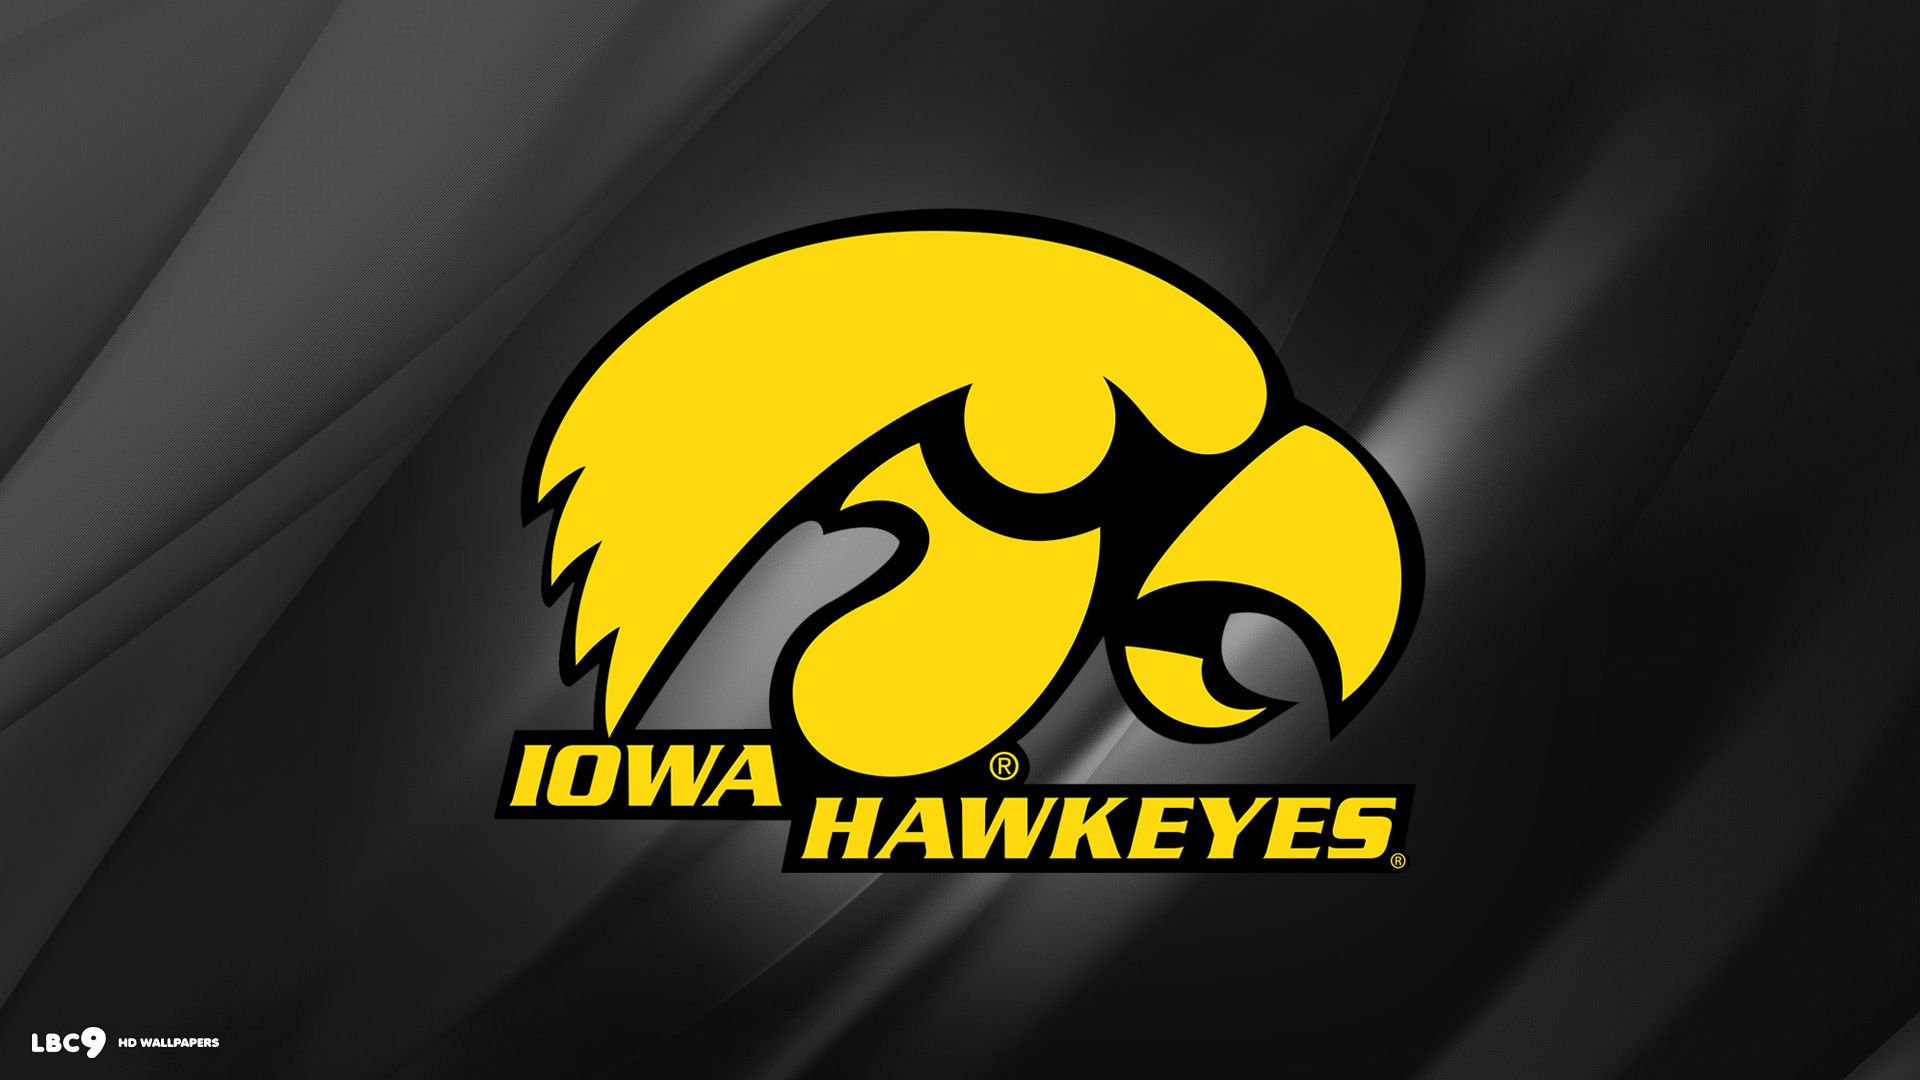 IOWA HAWKEYES college football wallpaper | 1920x1080 ...